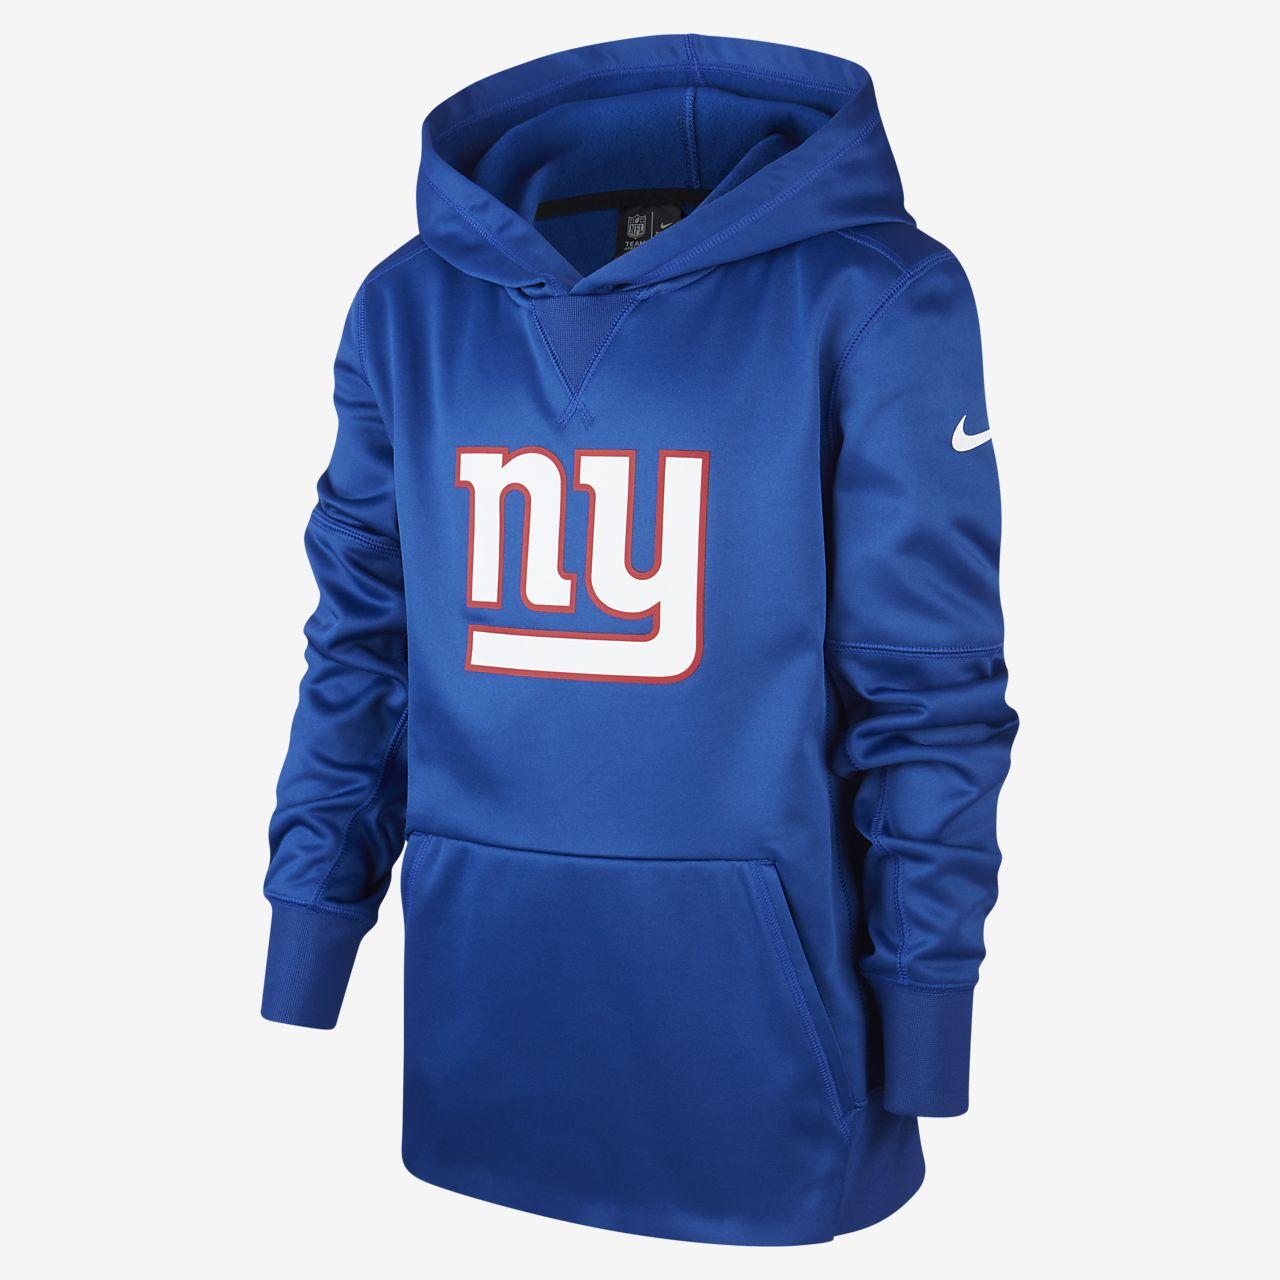 Nike (NFL Giants) Dessuadora amb caputxa - Nen/a